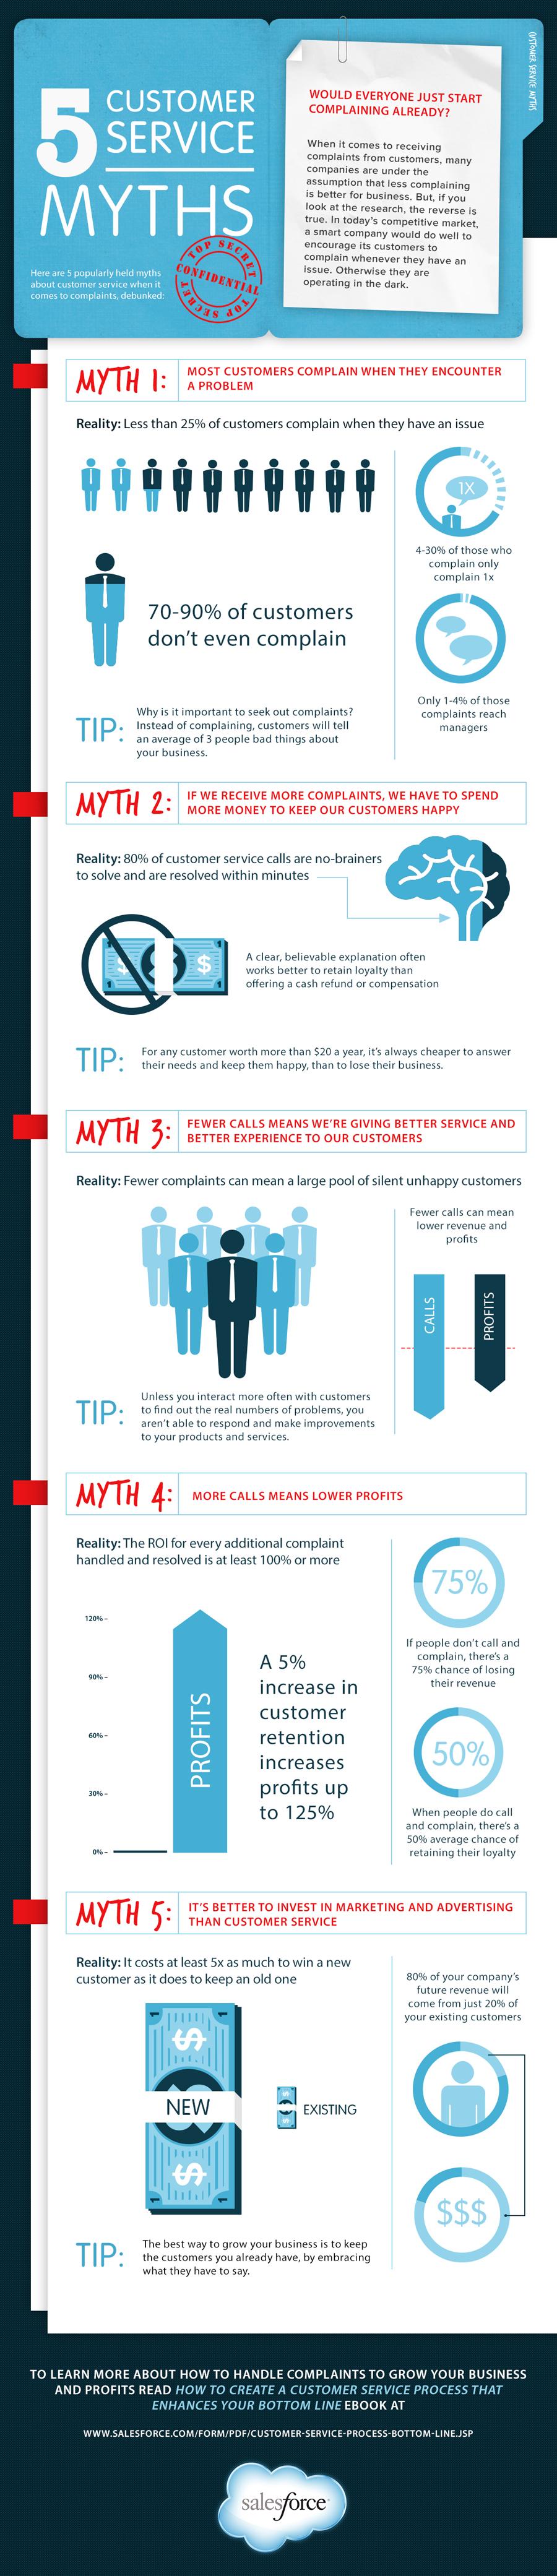 5-customer-service-myths